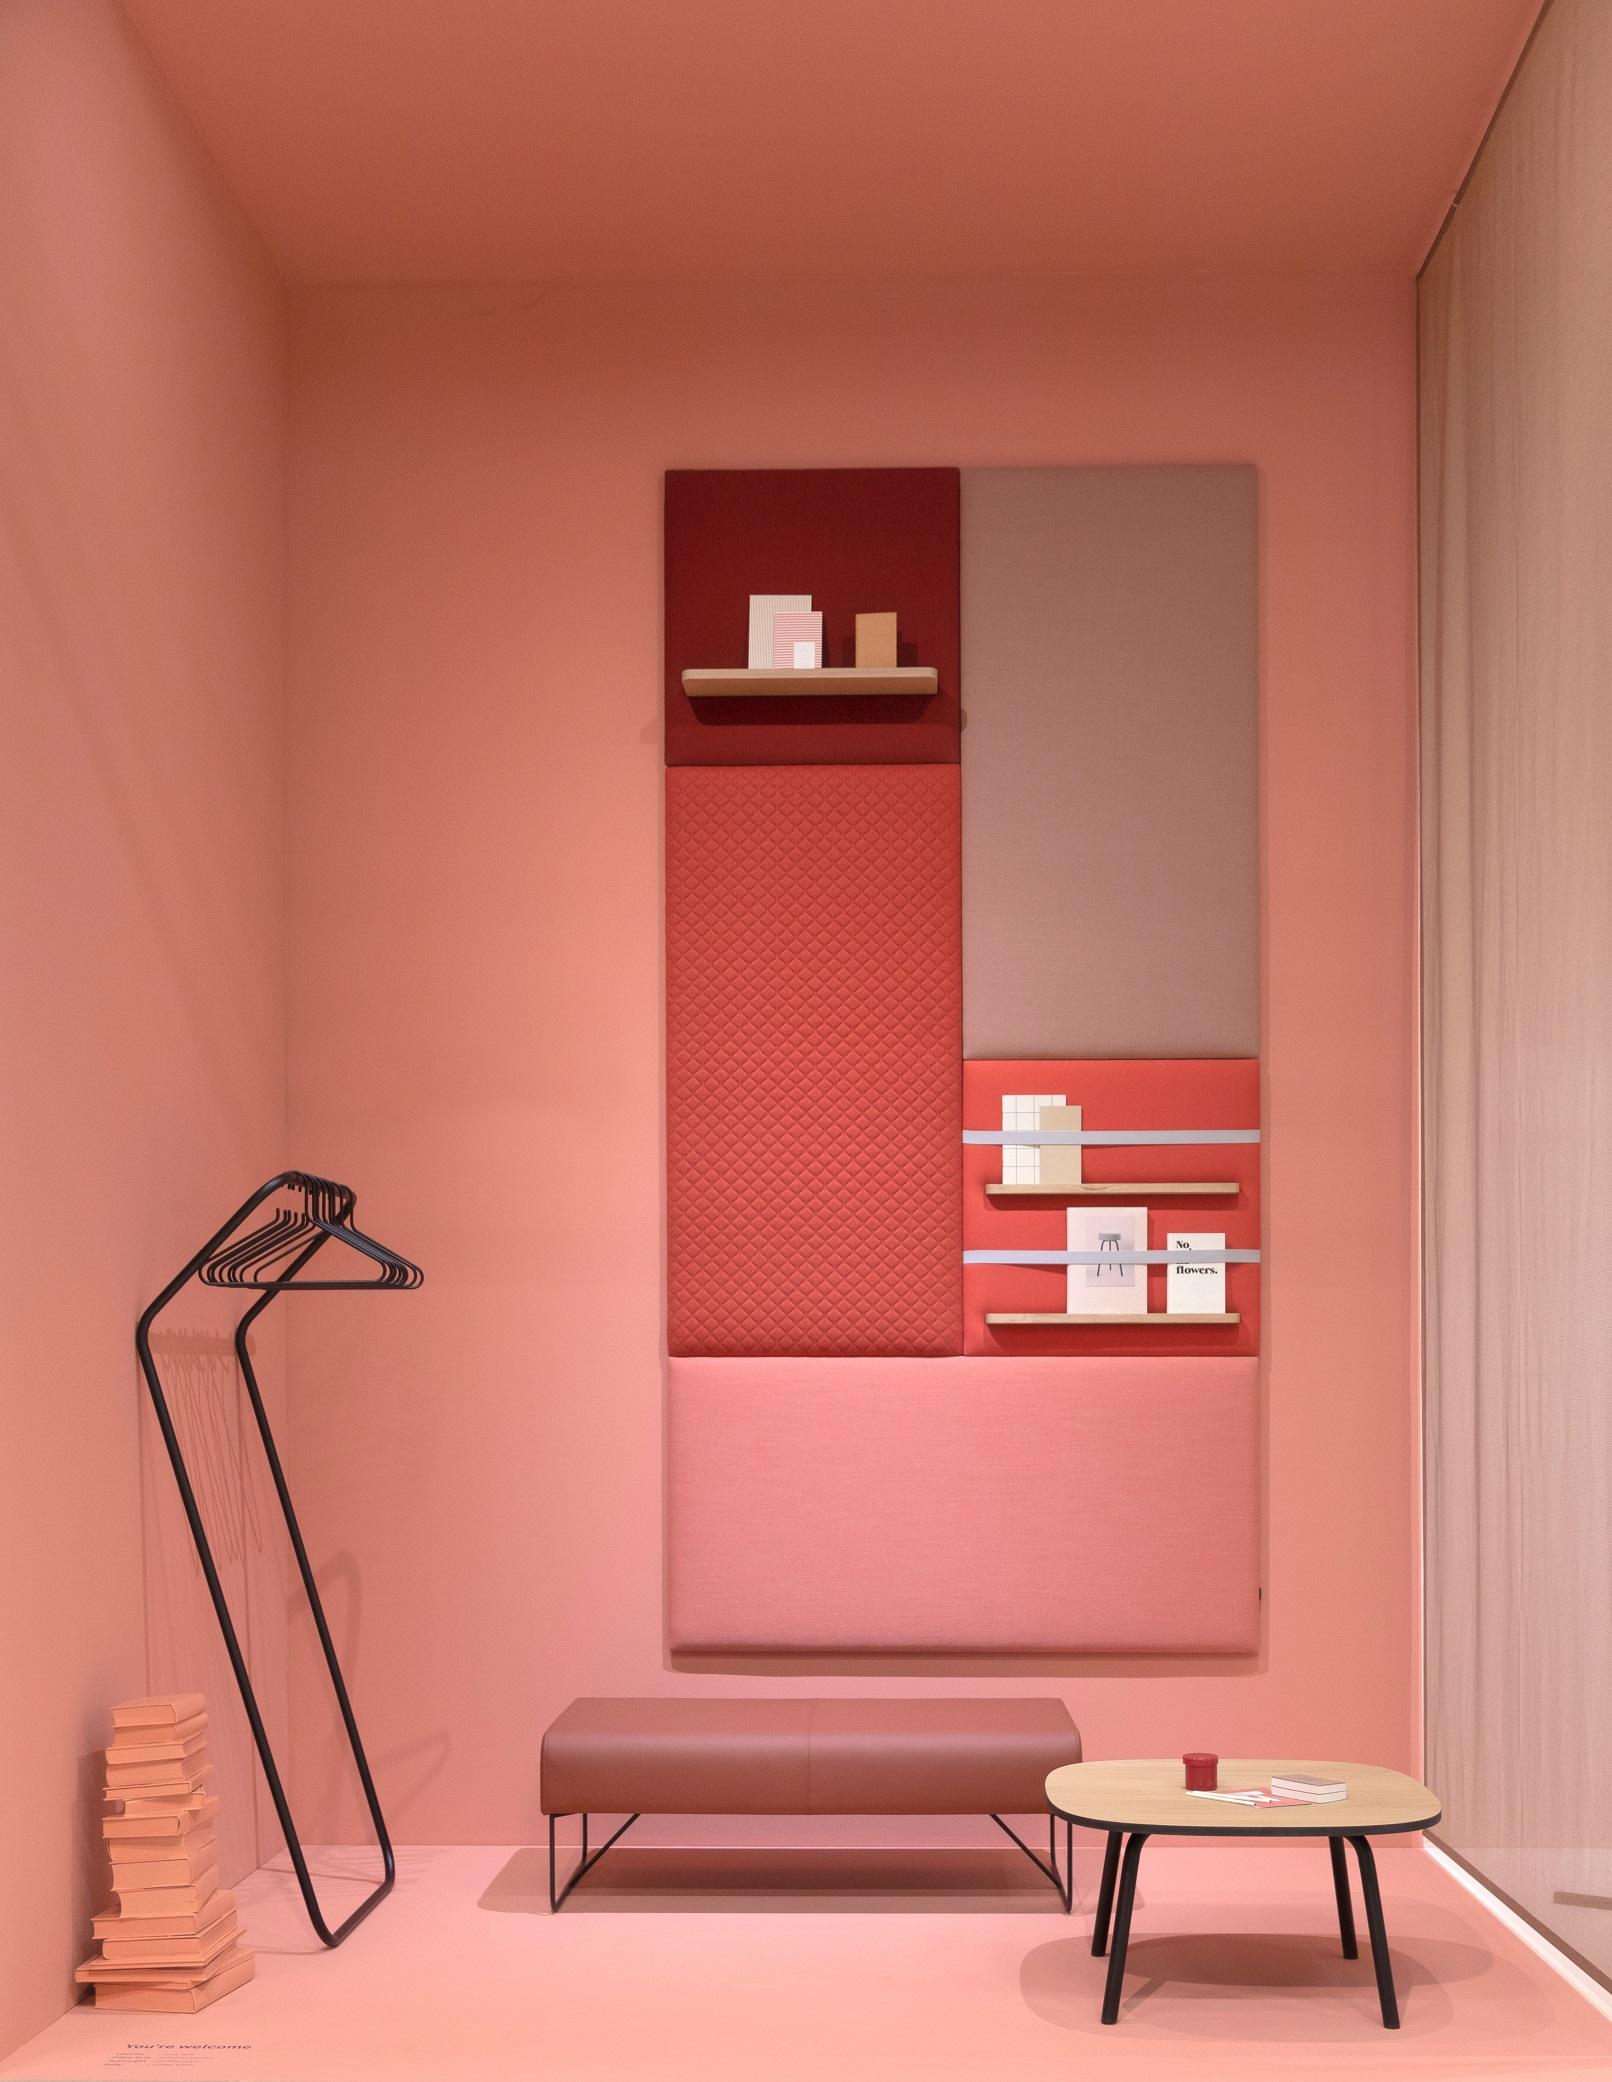 colores relajantes para dormitorio rosa